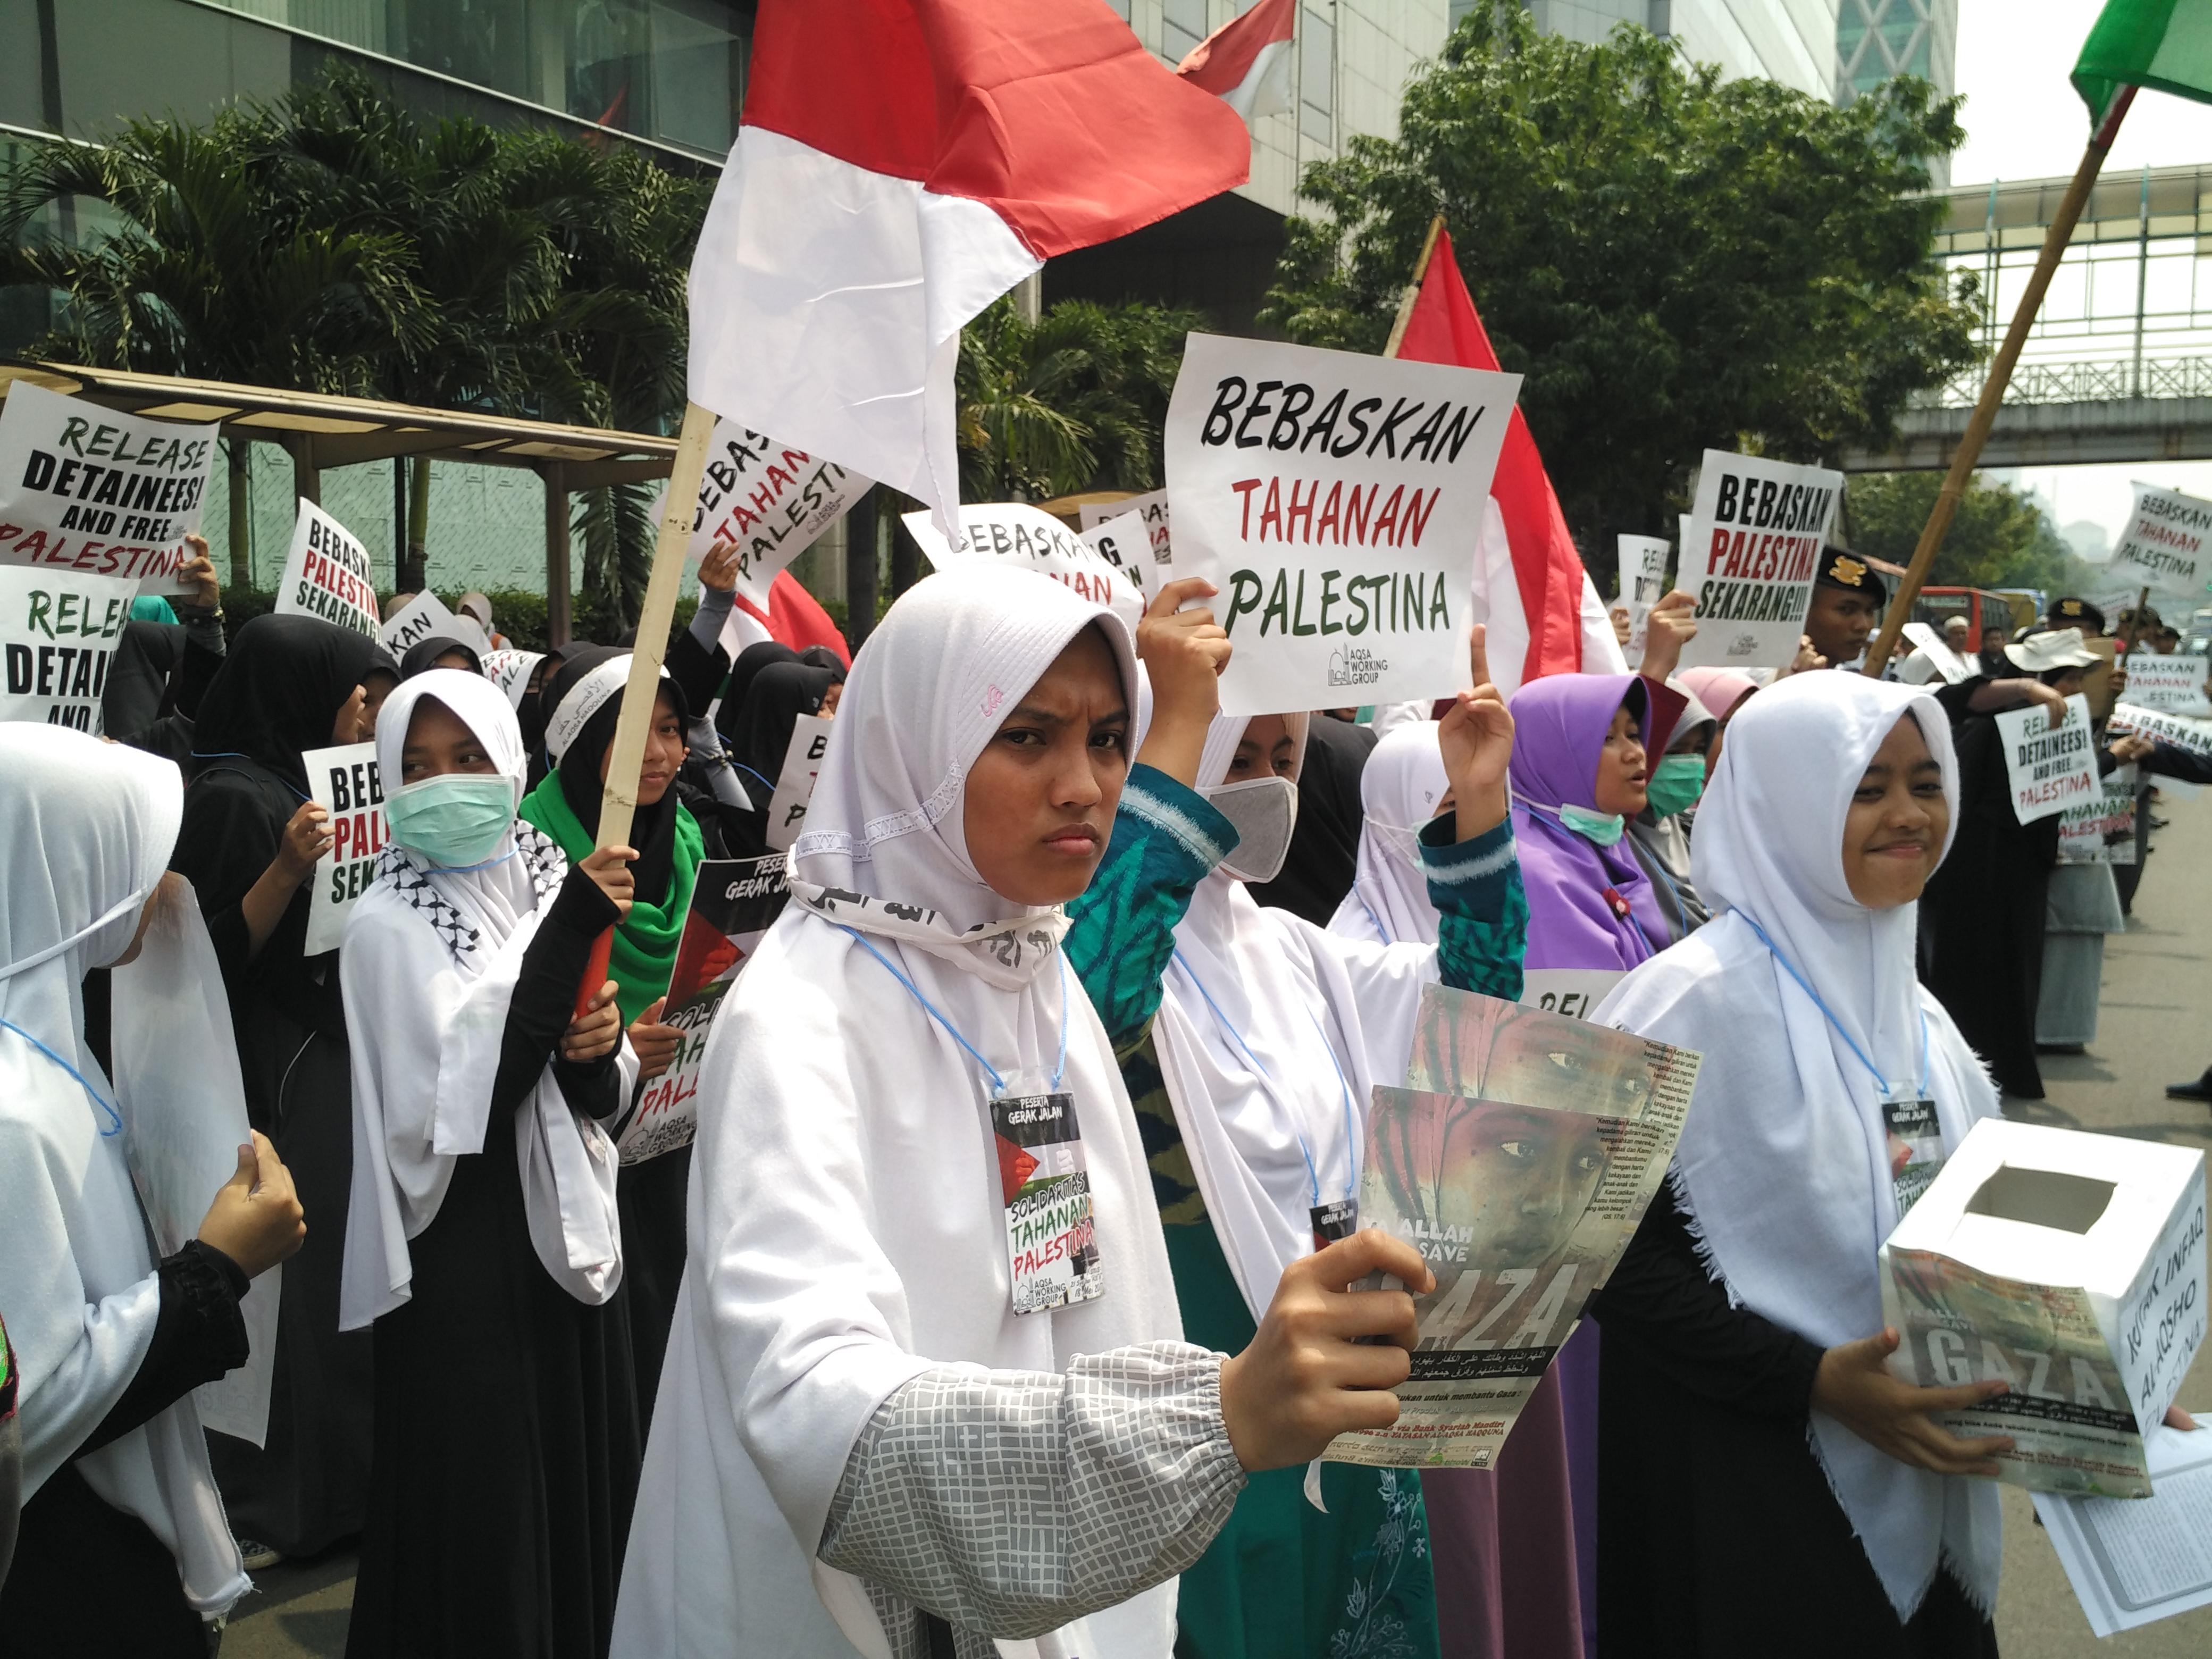 Kedubes Palestina: Terima Kasih Muslimin Indonesia Konsisten Bela Al-Aqsha